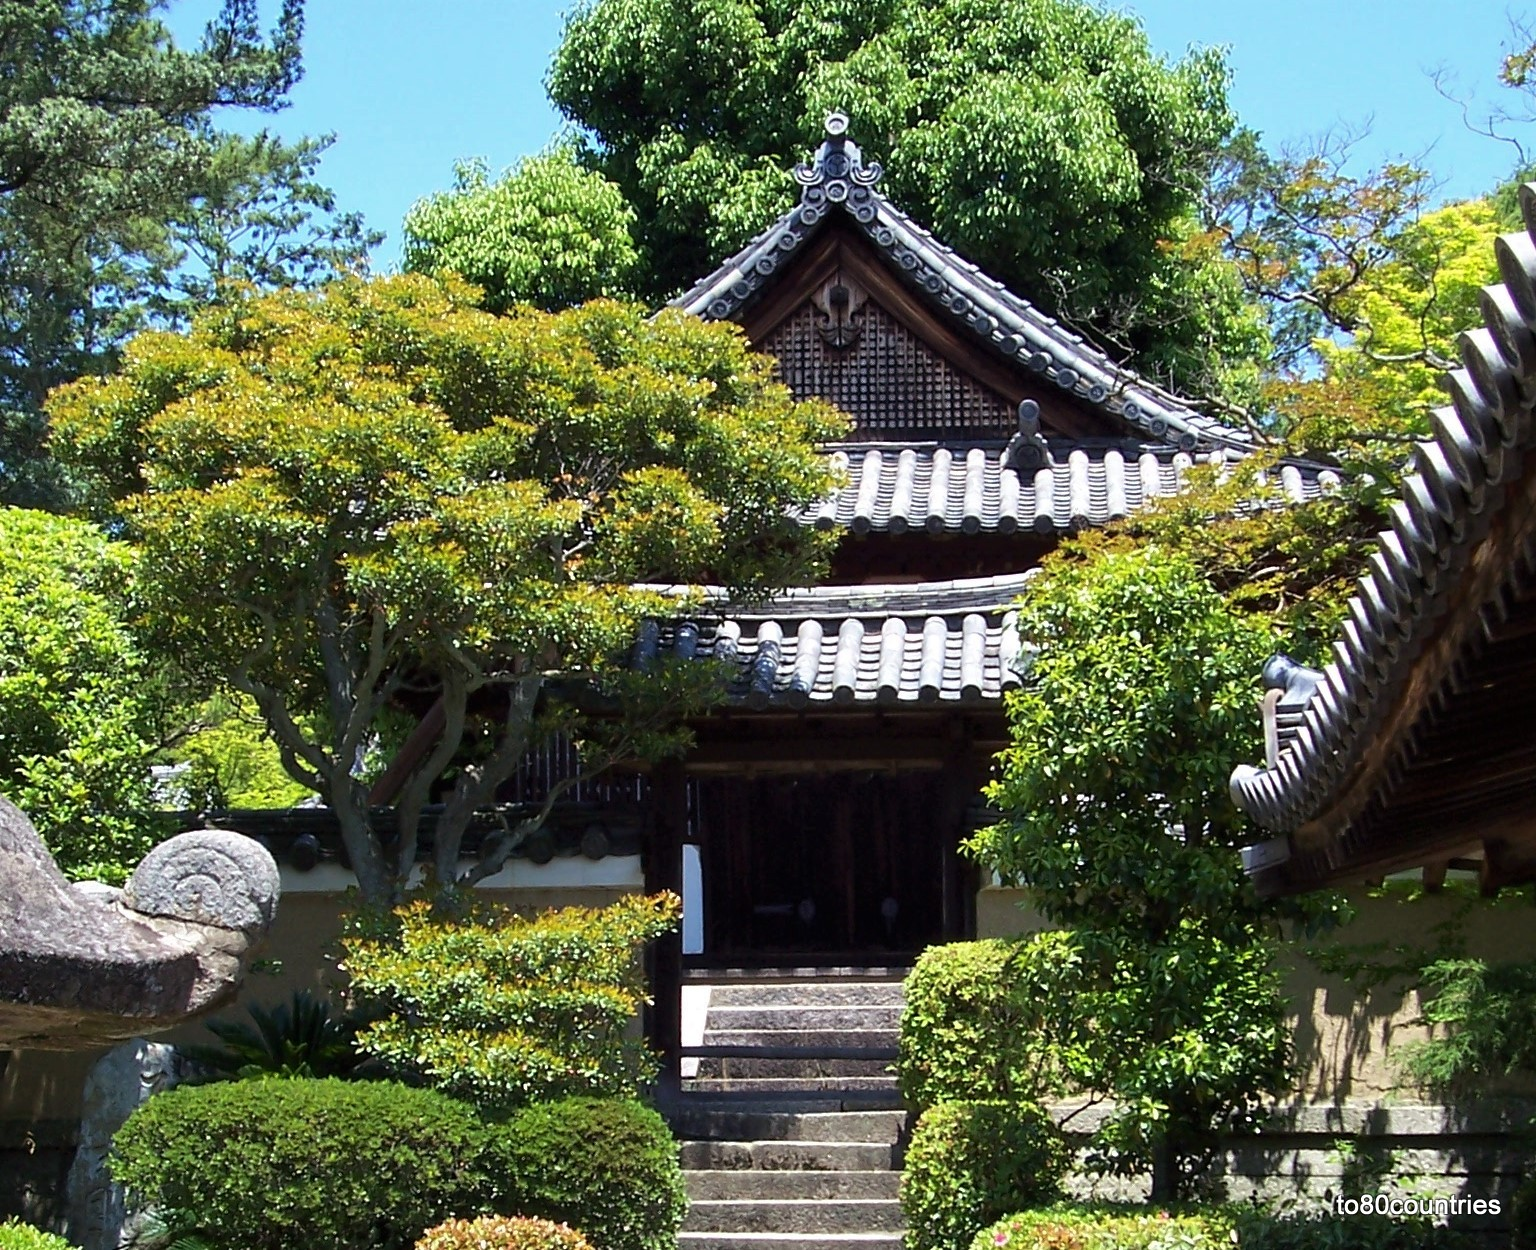 Toshodai-ji Tempel in Nishinokyo - Japan